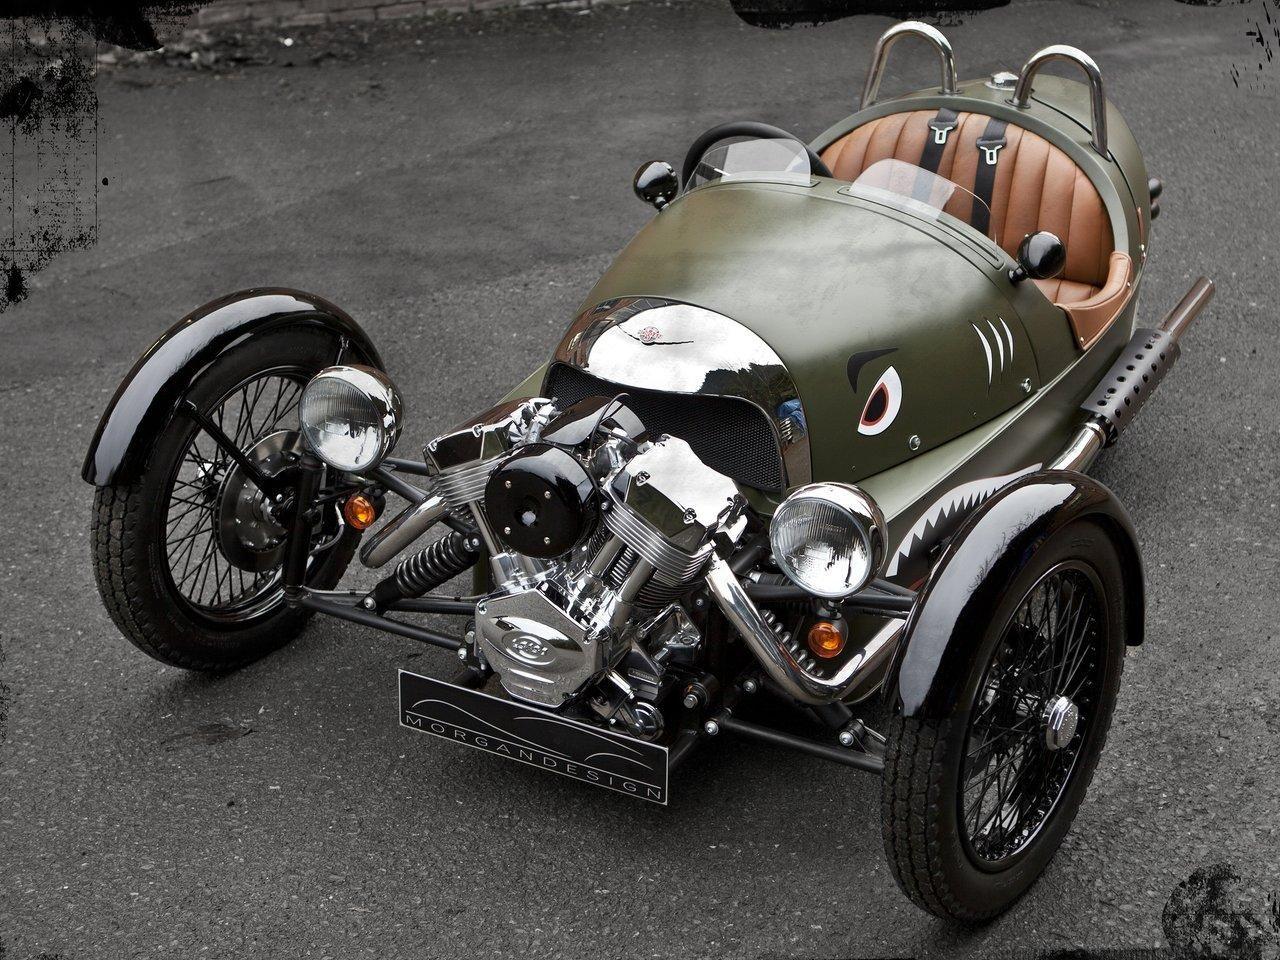 Sidecar tricycle rules custom sidecar v twin tricycle trike